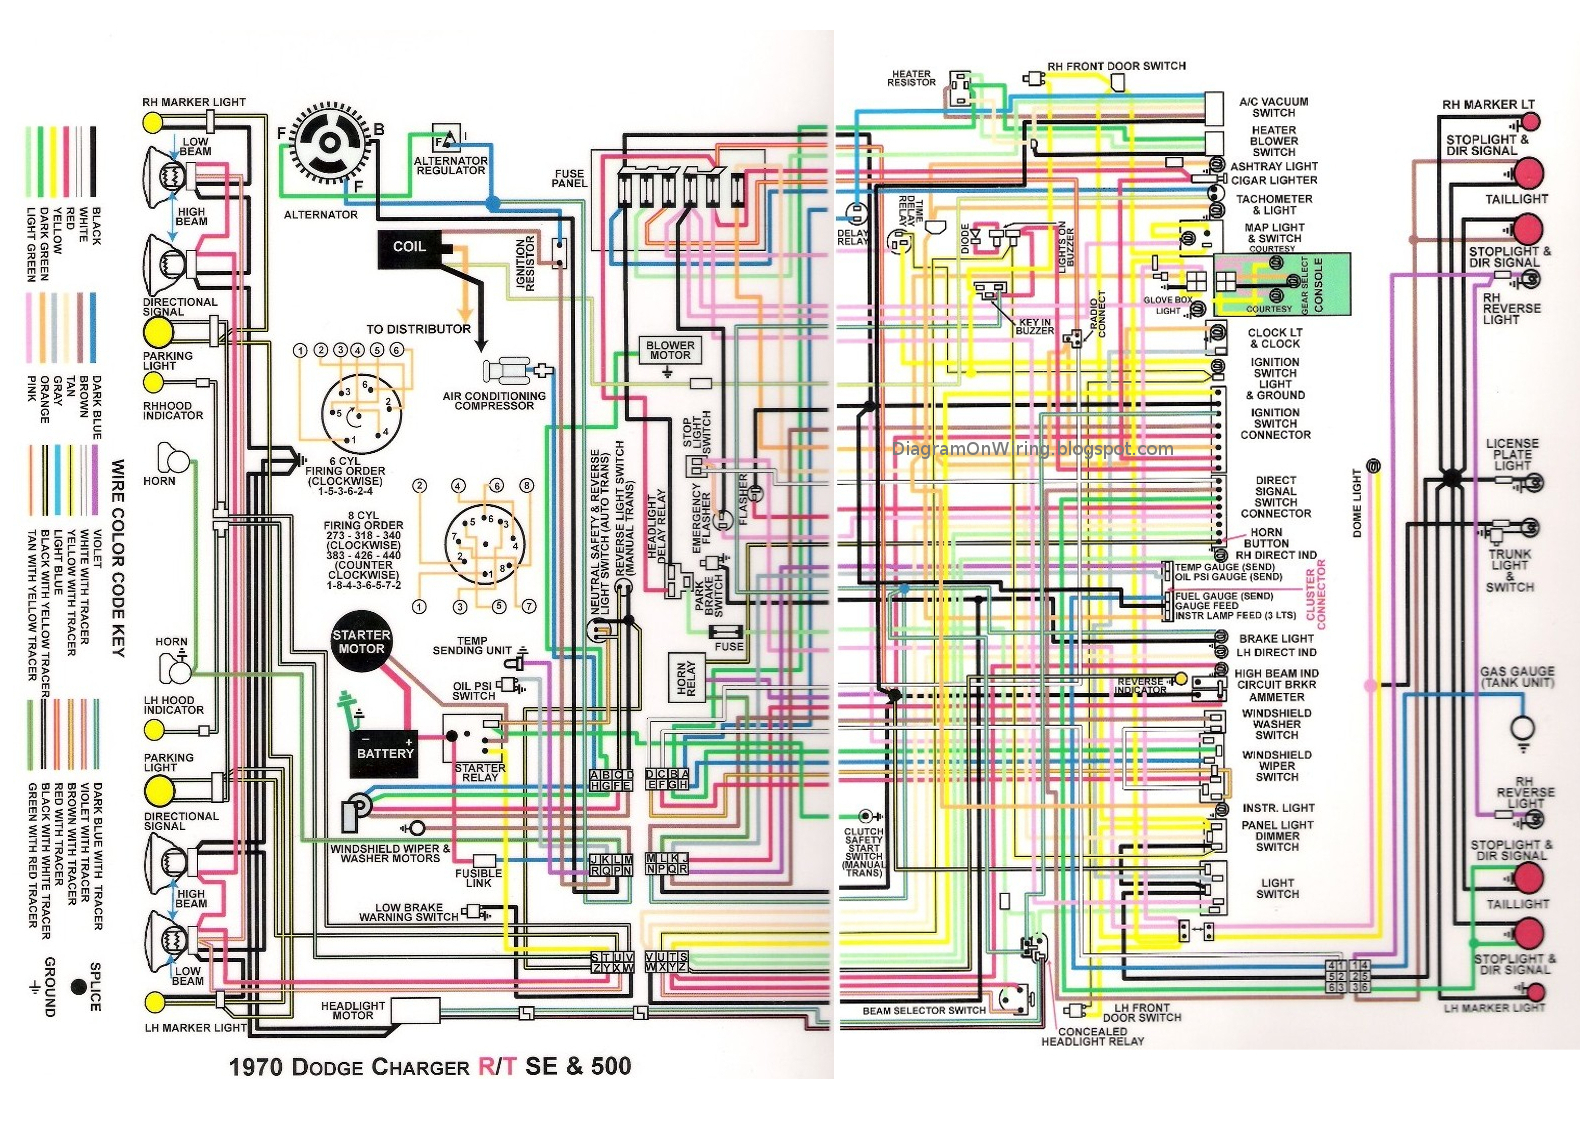 Incredible Dodge Charger R T Se And 500 1970 Complete Wiring Diagram Wiring Wiring Cloud Ittabpendurdonanfuldomelitekicepsianuembamohammedshrineorg